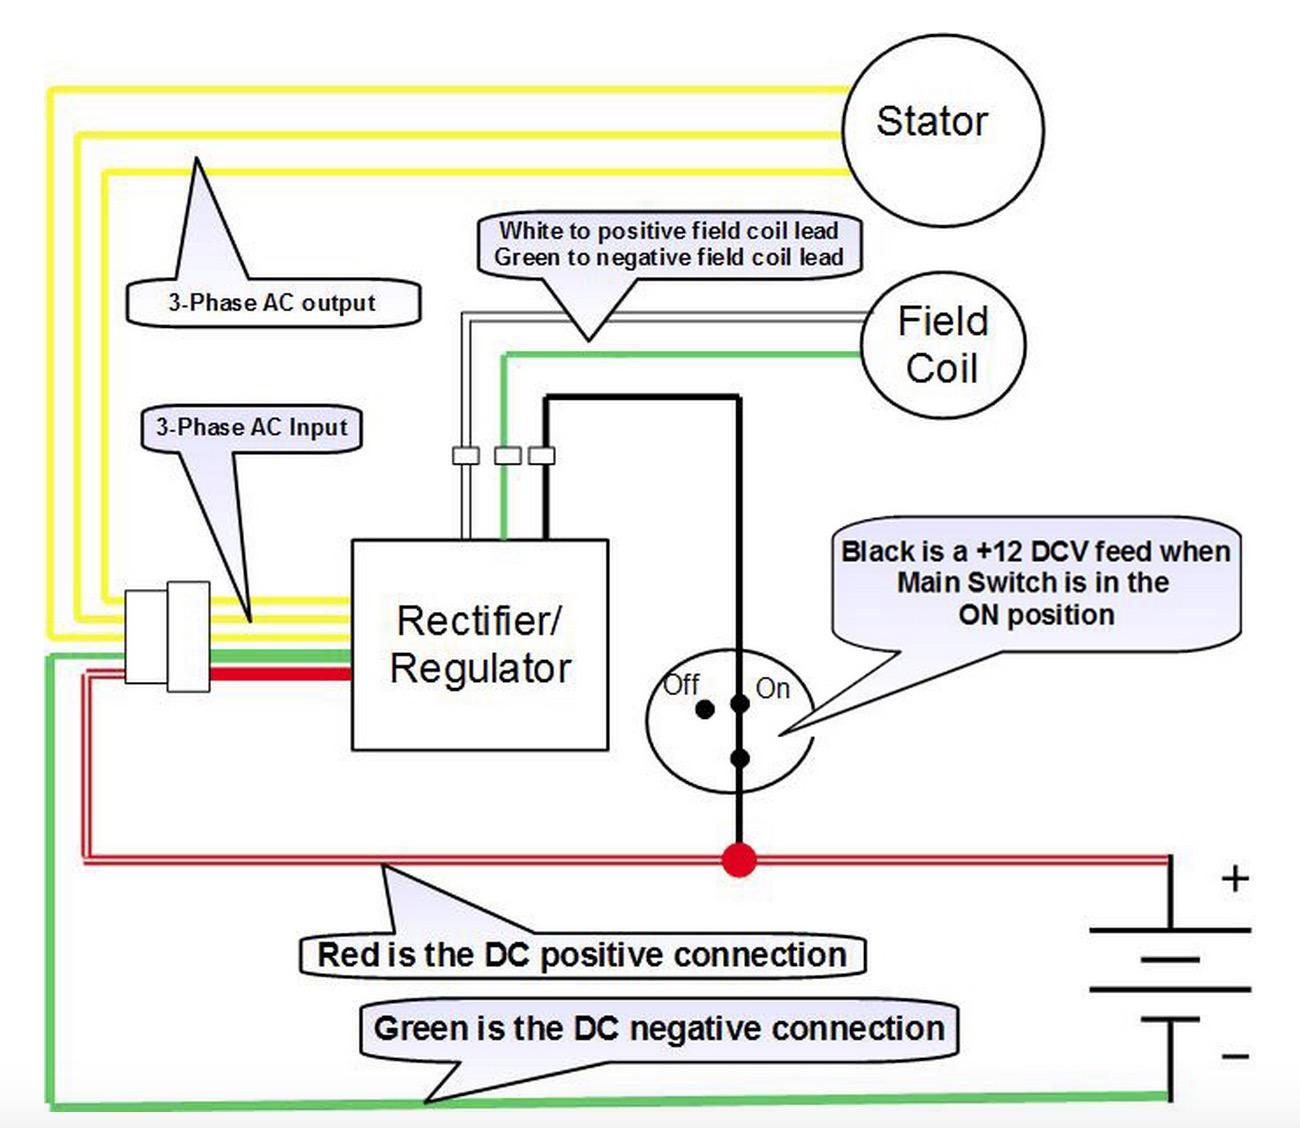 1981 cb750 wiring diagram window ac aftermarket honda regulator rectifier | oem style replacement part